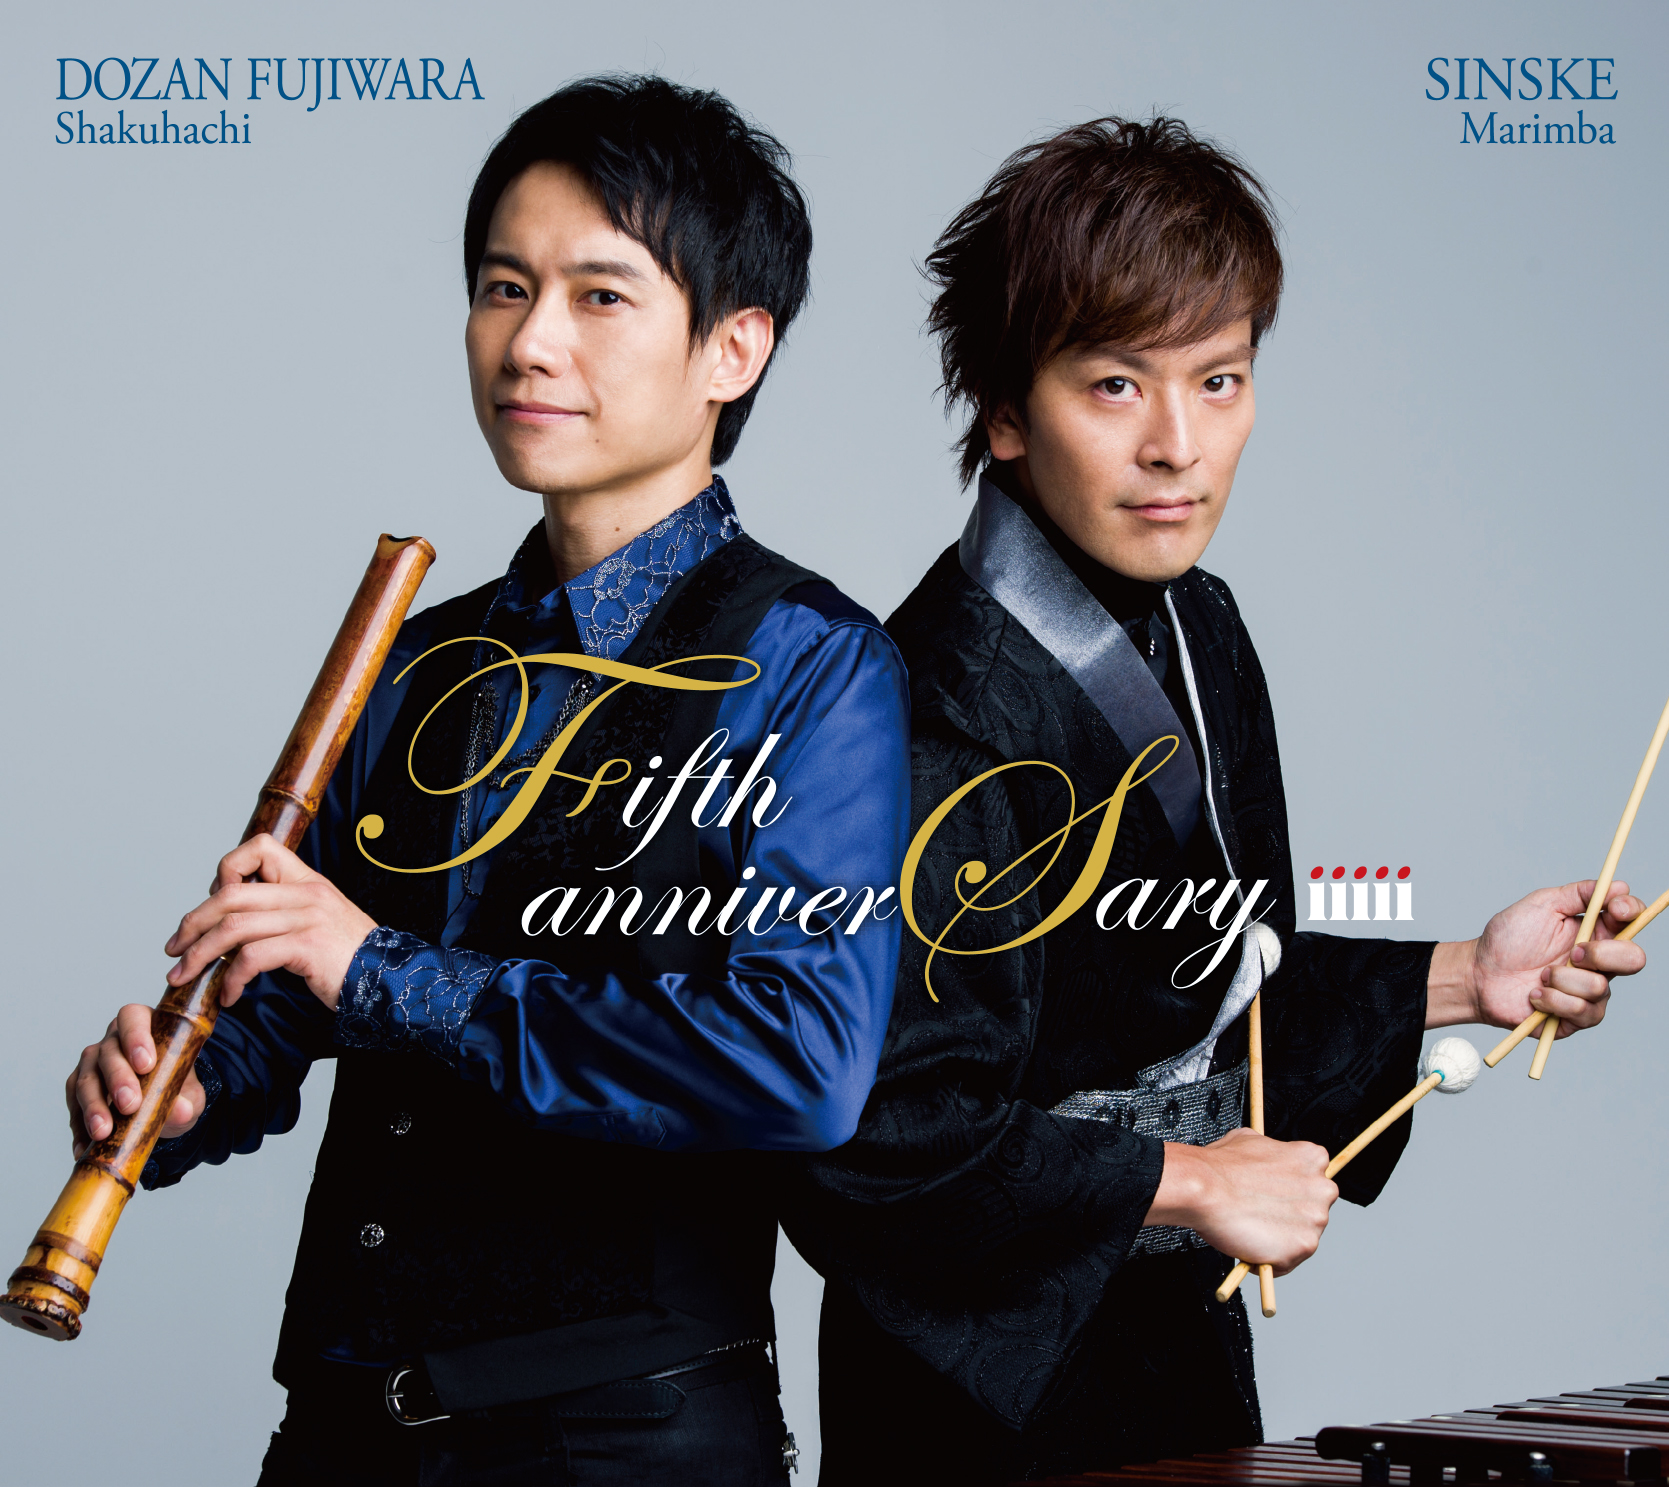 Fifth anniverSary iiiii/藤原道山×SINSKE[3942]